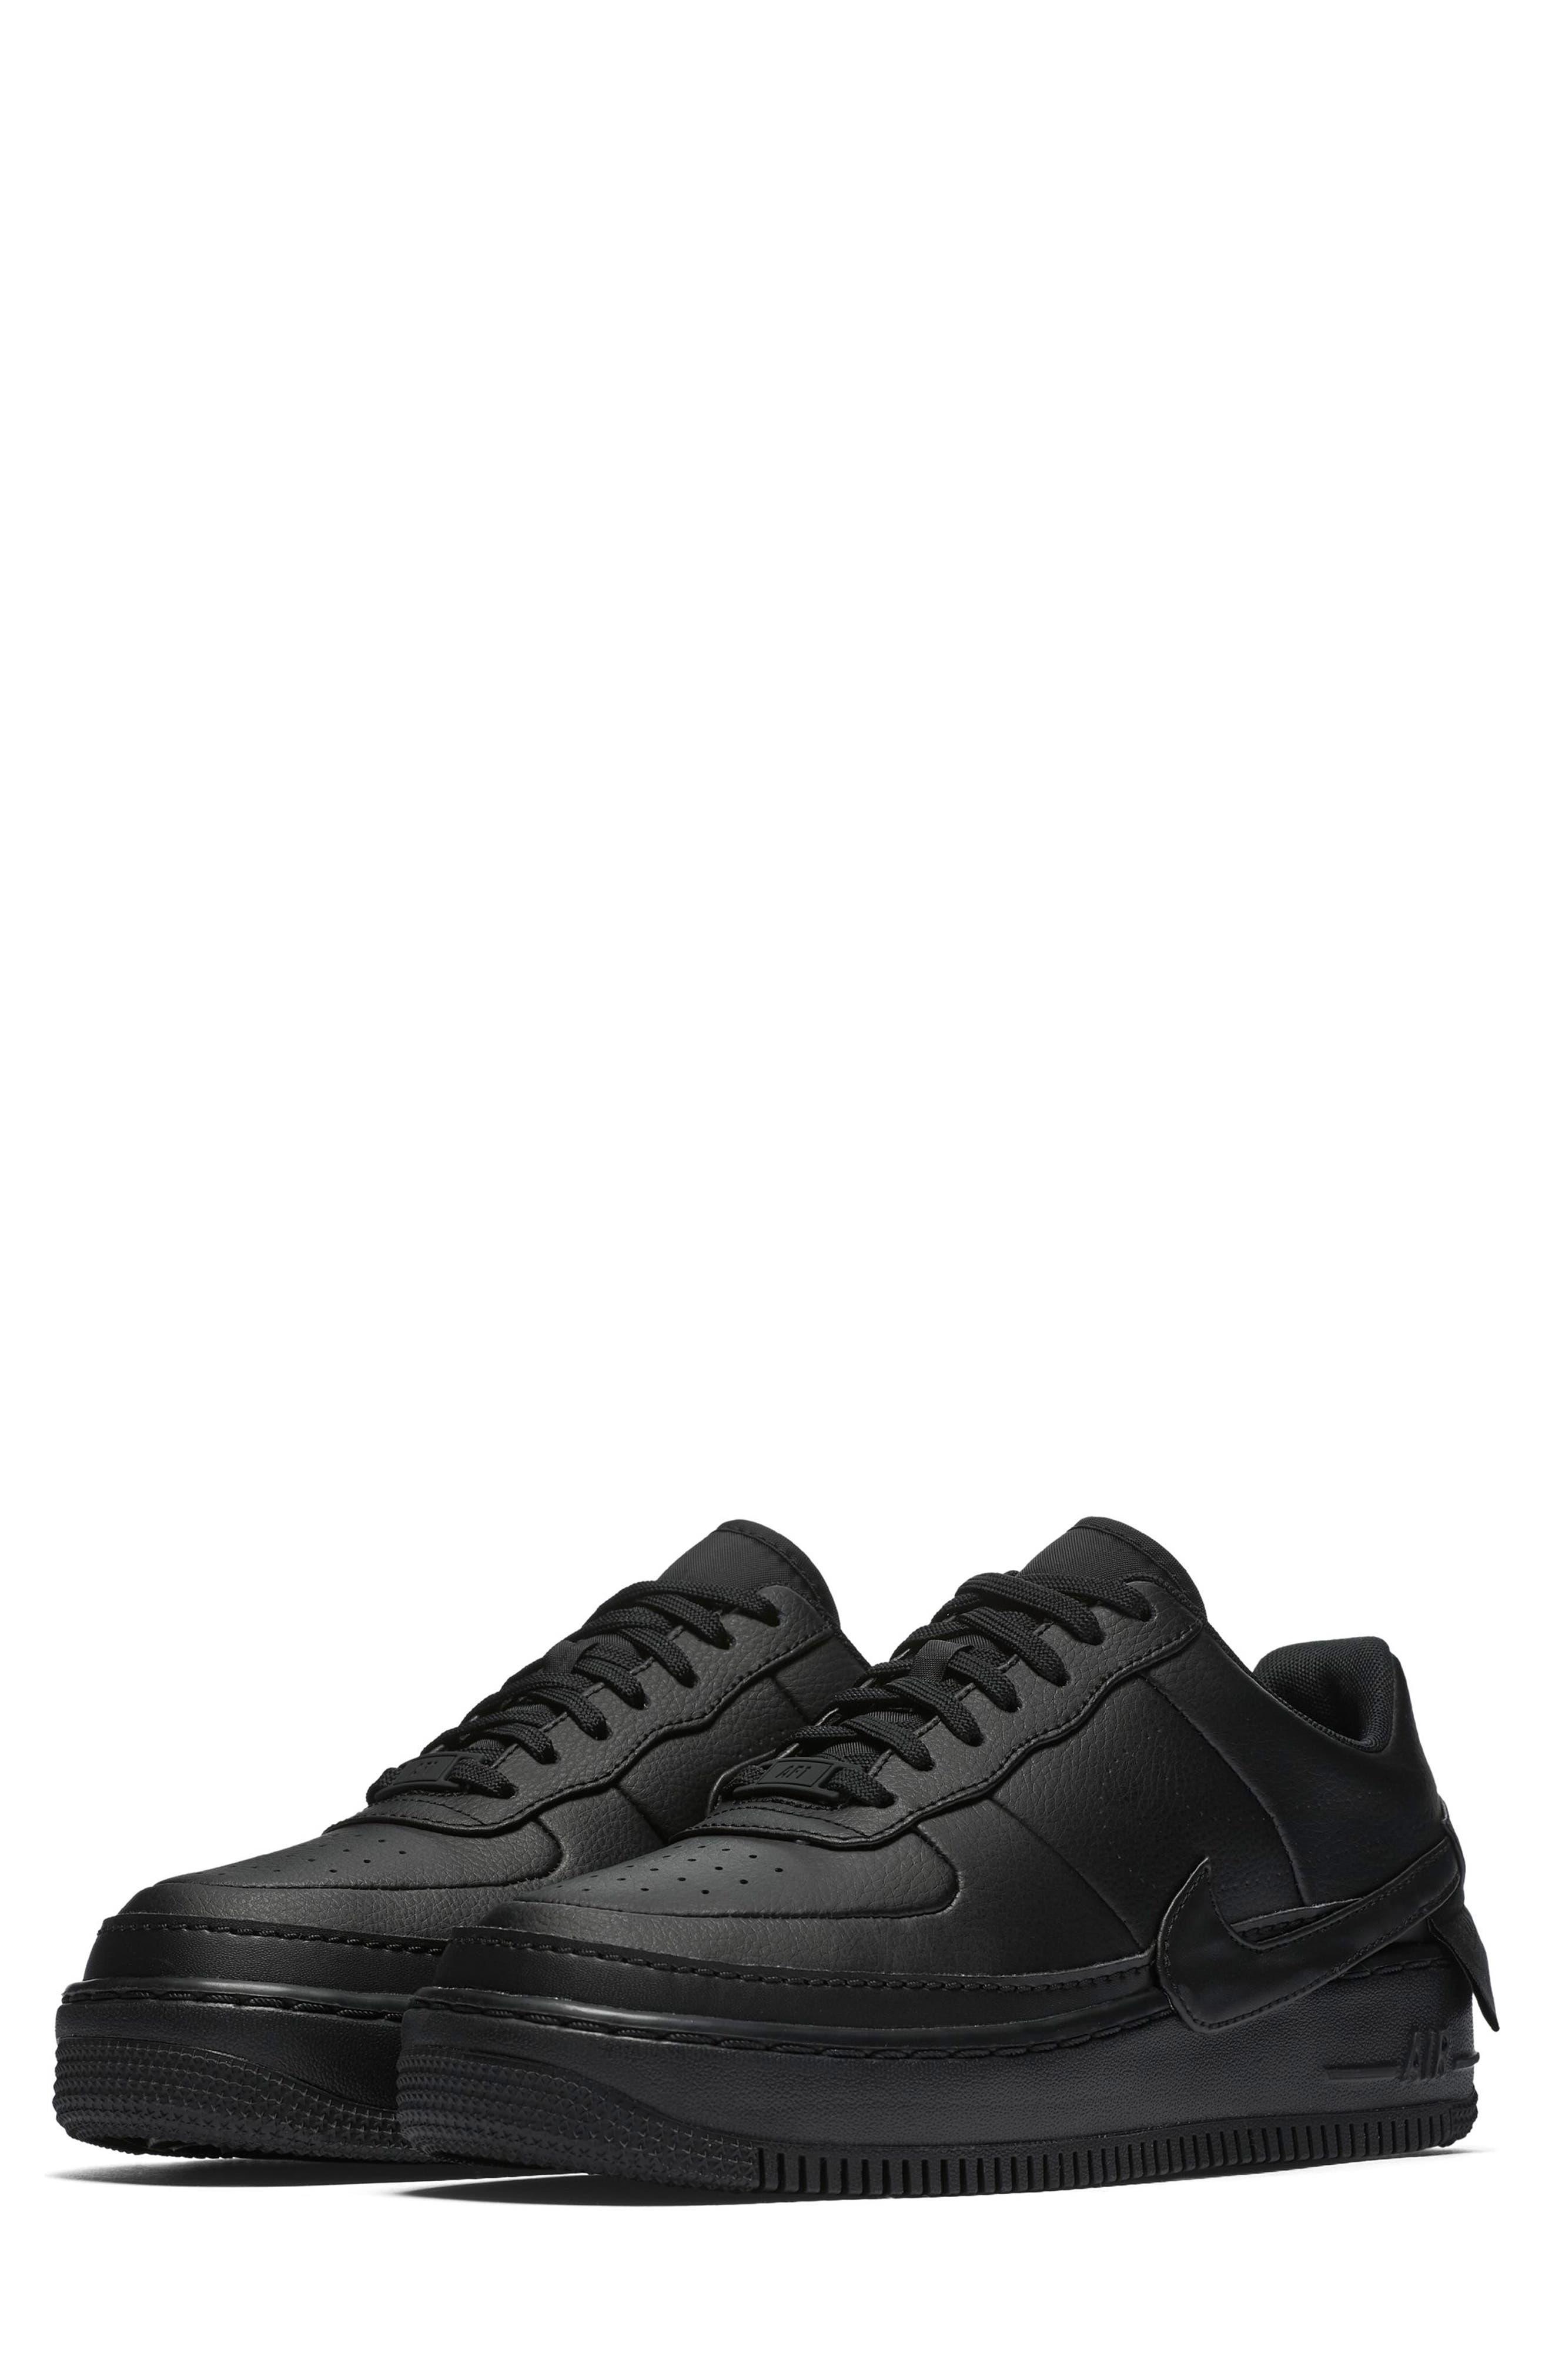 a0b533c9b22 Nike Air Force 1 Jester Xx Sneaker